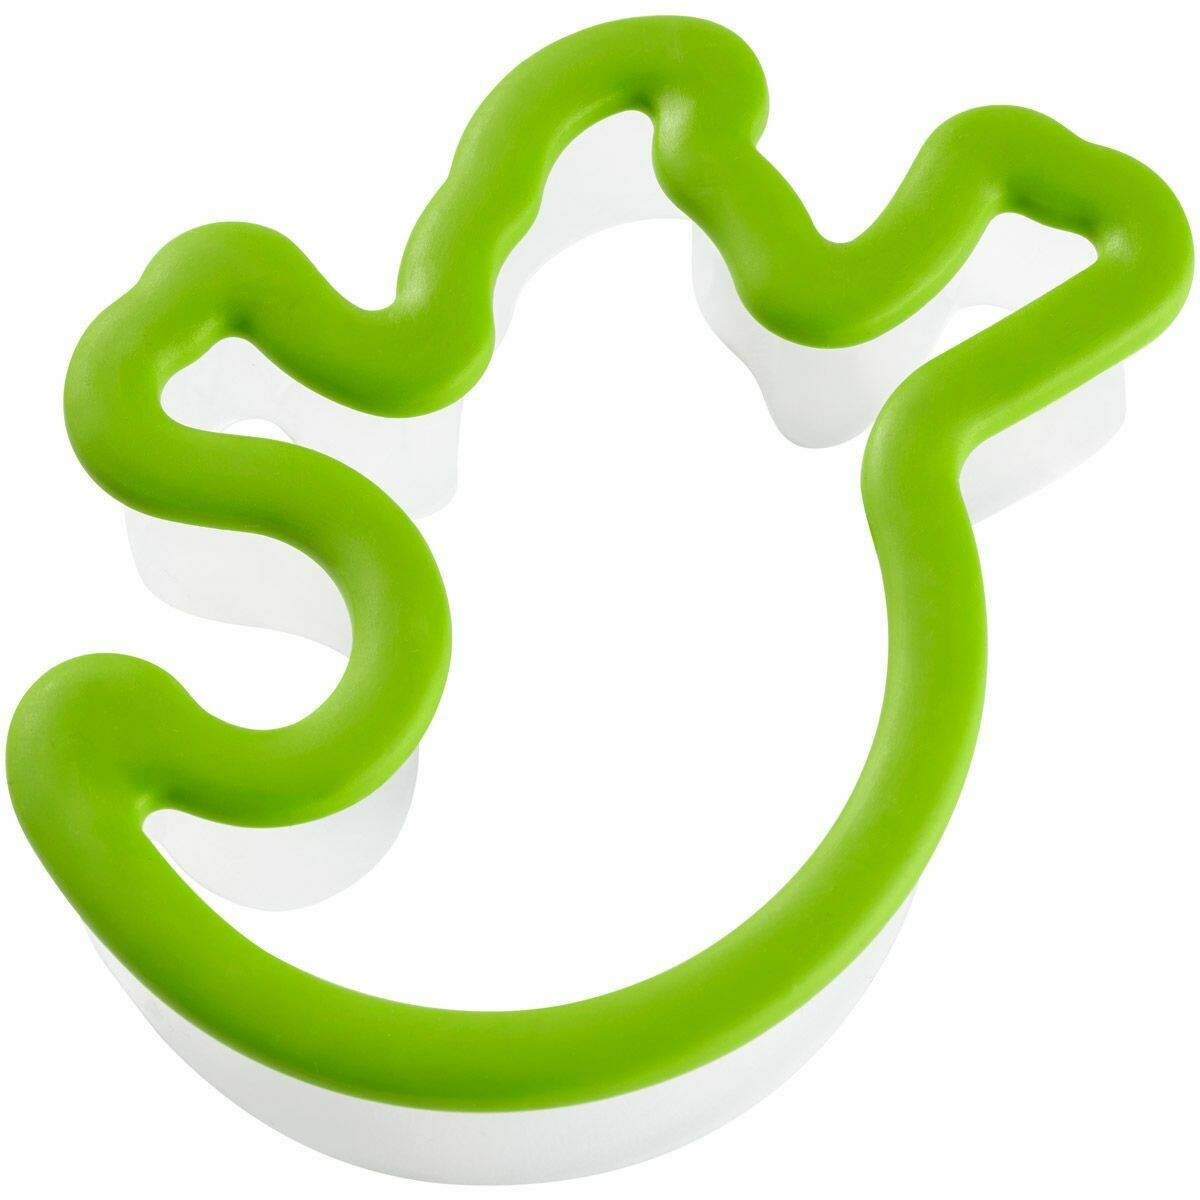 Wilton Halloween Plastic Grippy Cutter -GHOST - Πλαστικό Kουπ πατ Φάντασμα με λαβή σιλικόνης